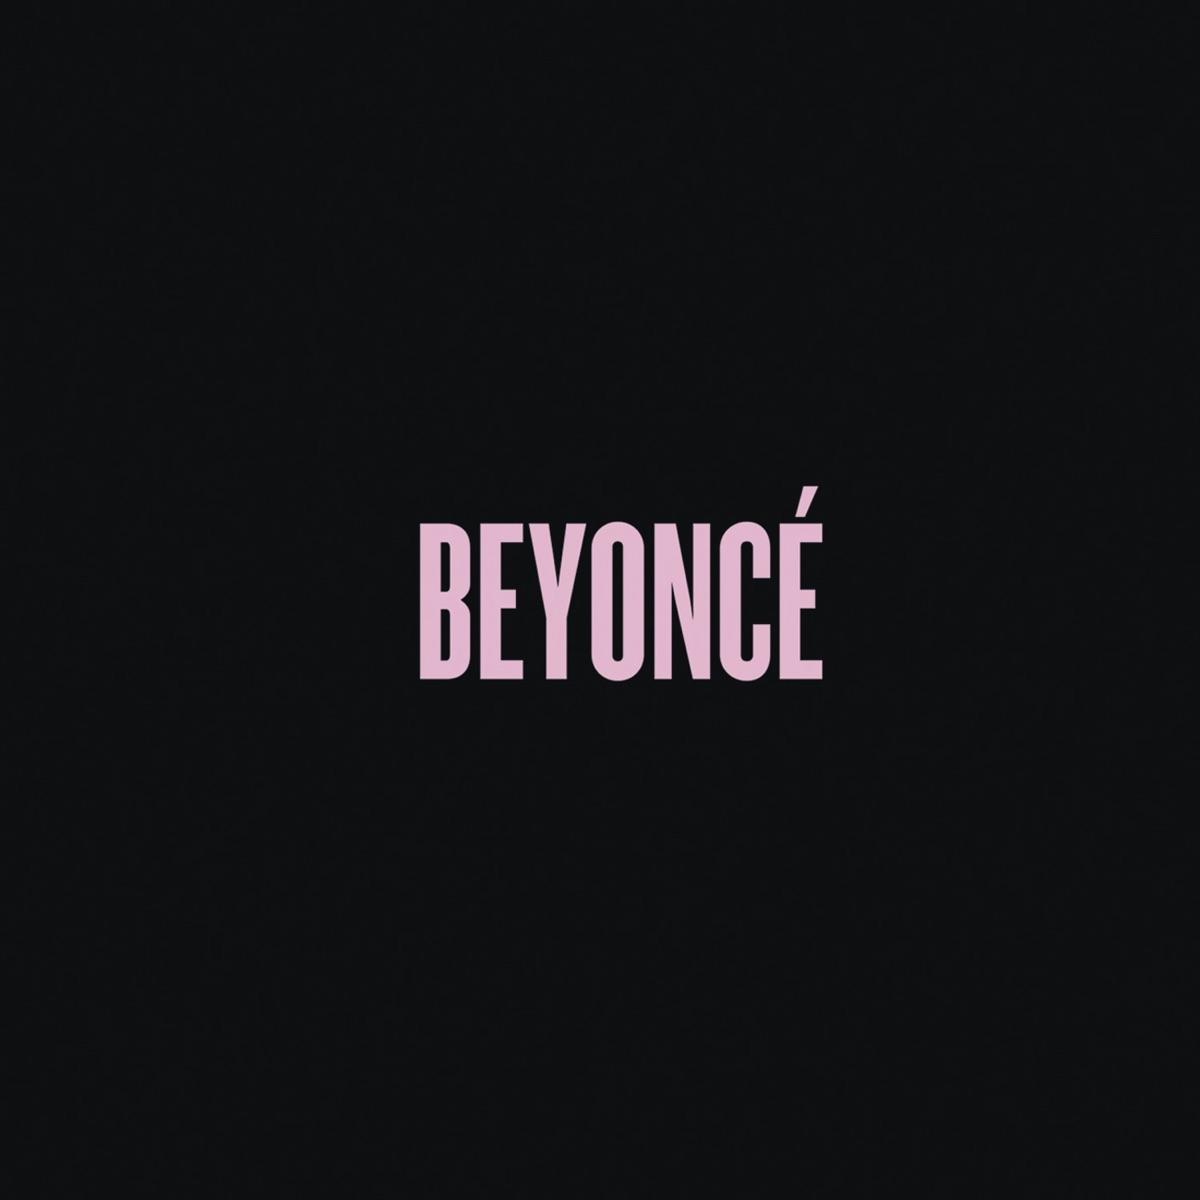 BEYONCÉ Beyoncé CD cover